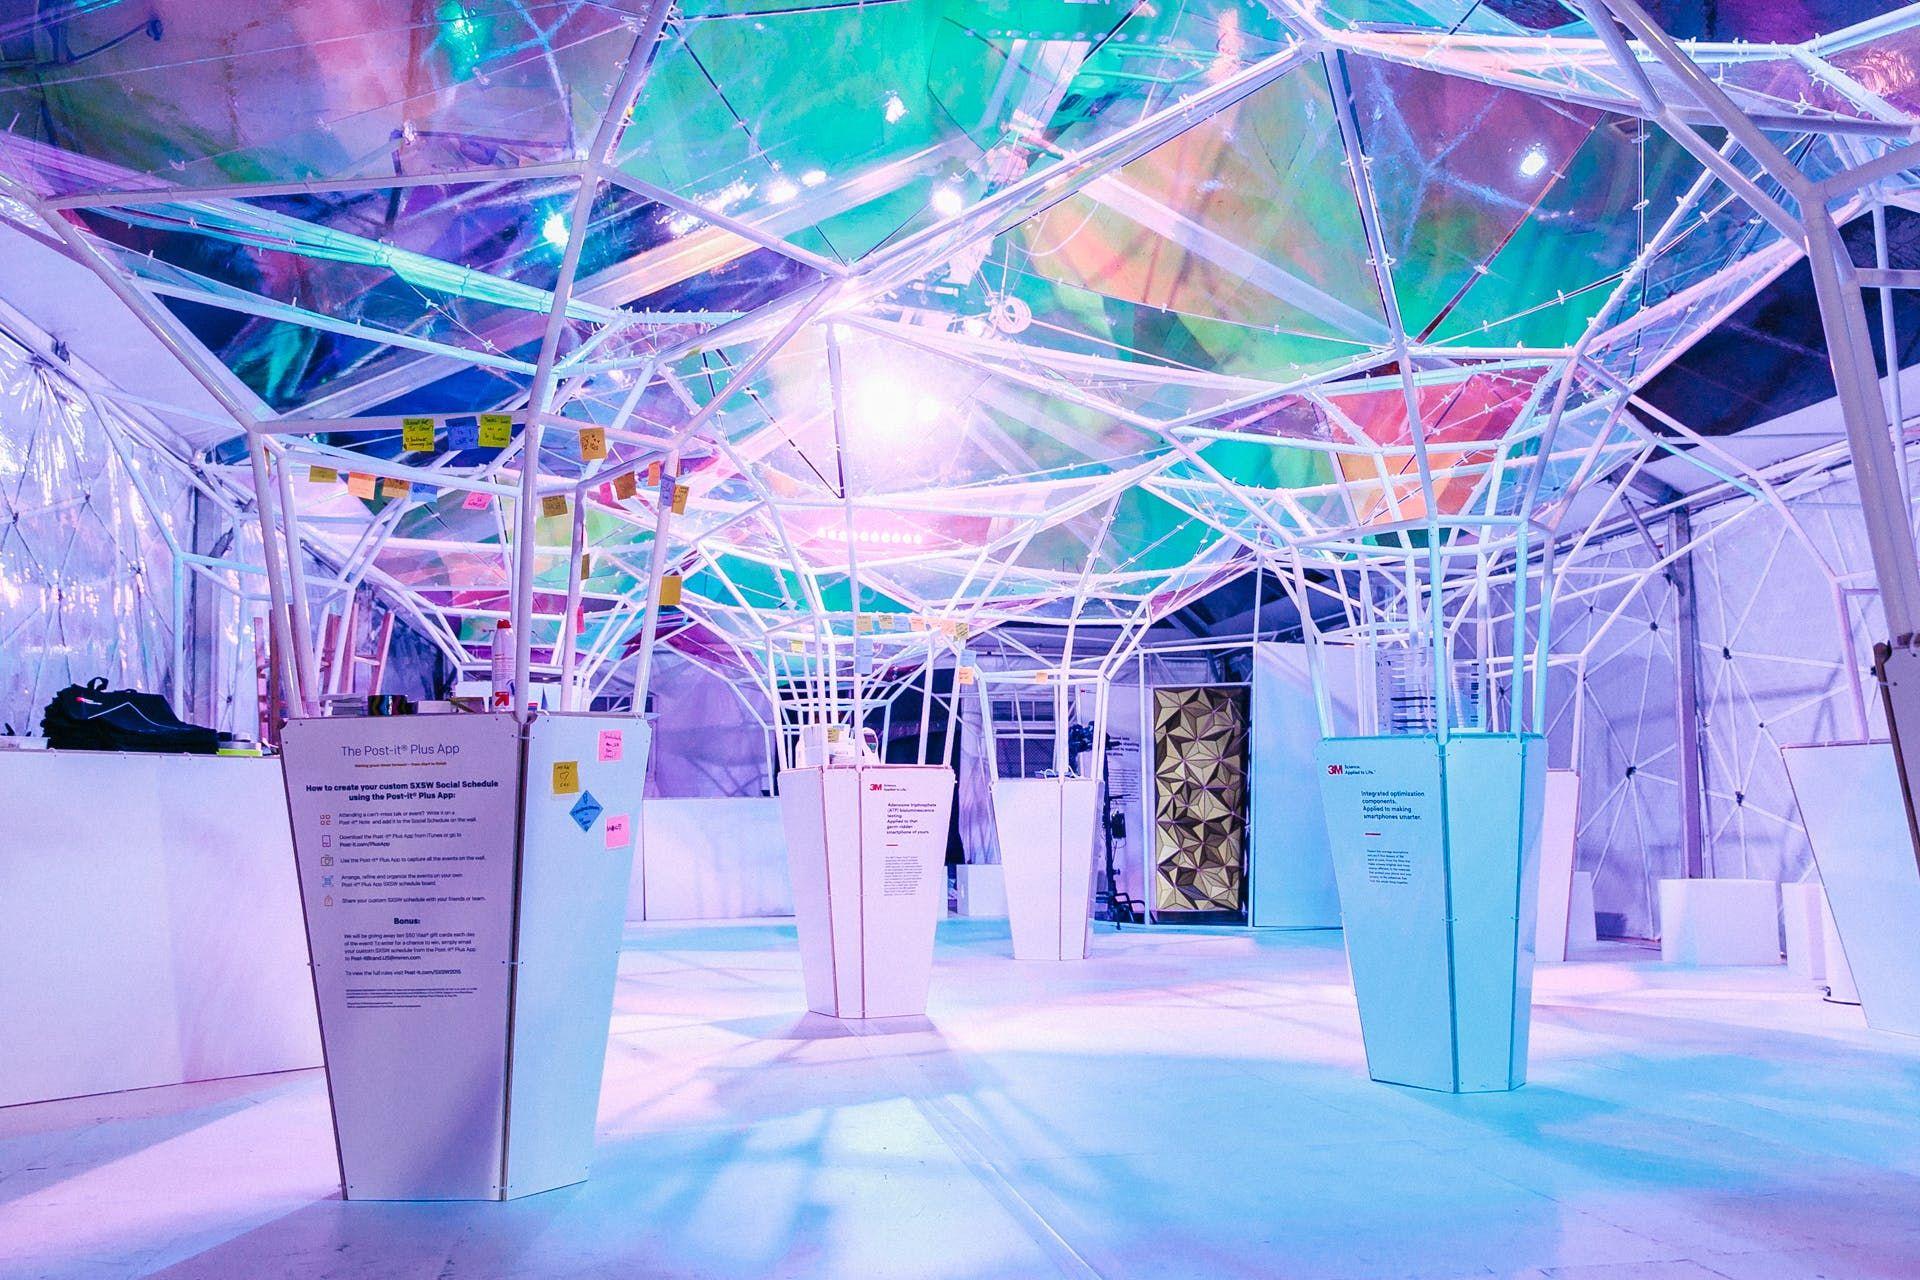 3m Lifelab Sxsw Softlab Archinect Design Milk Exhibition Design Design